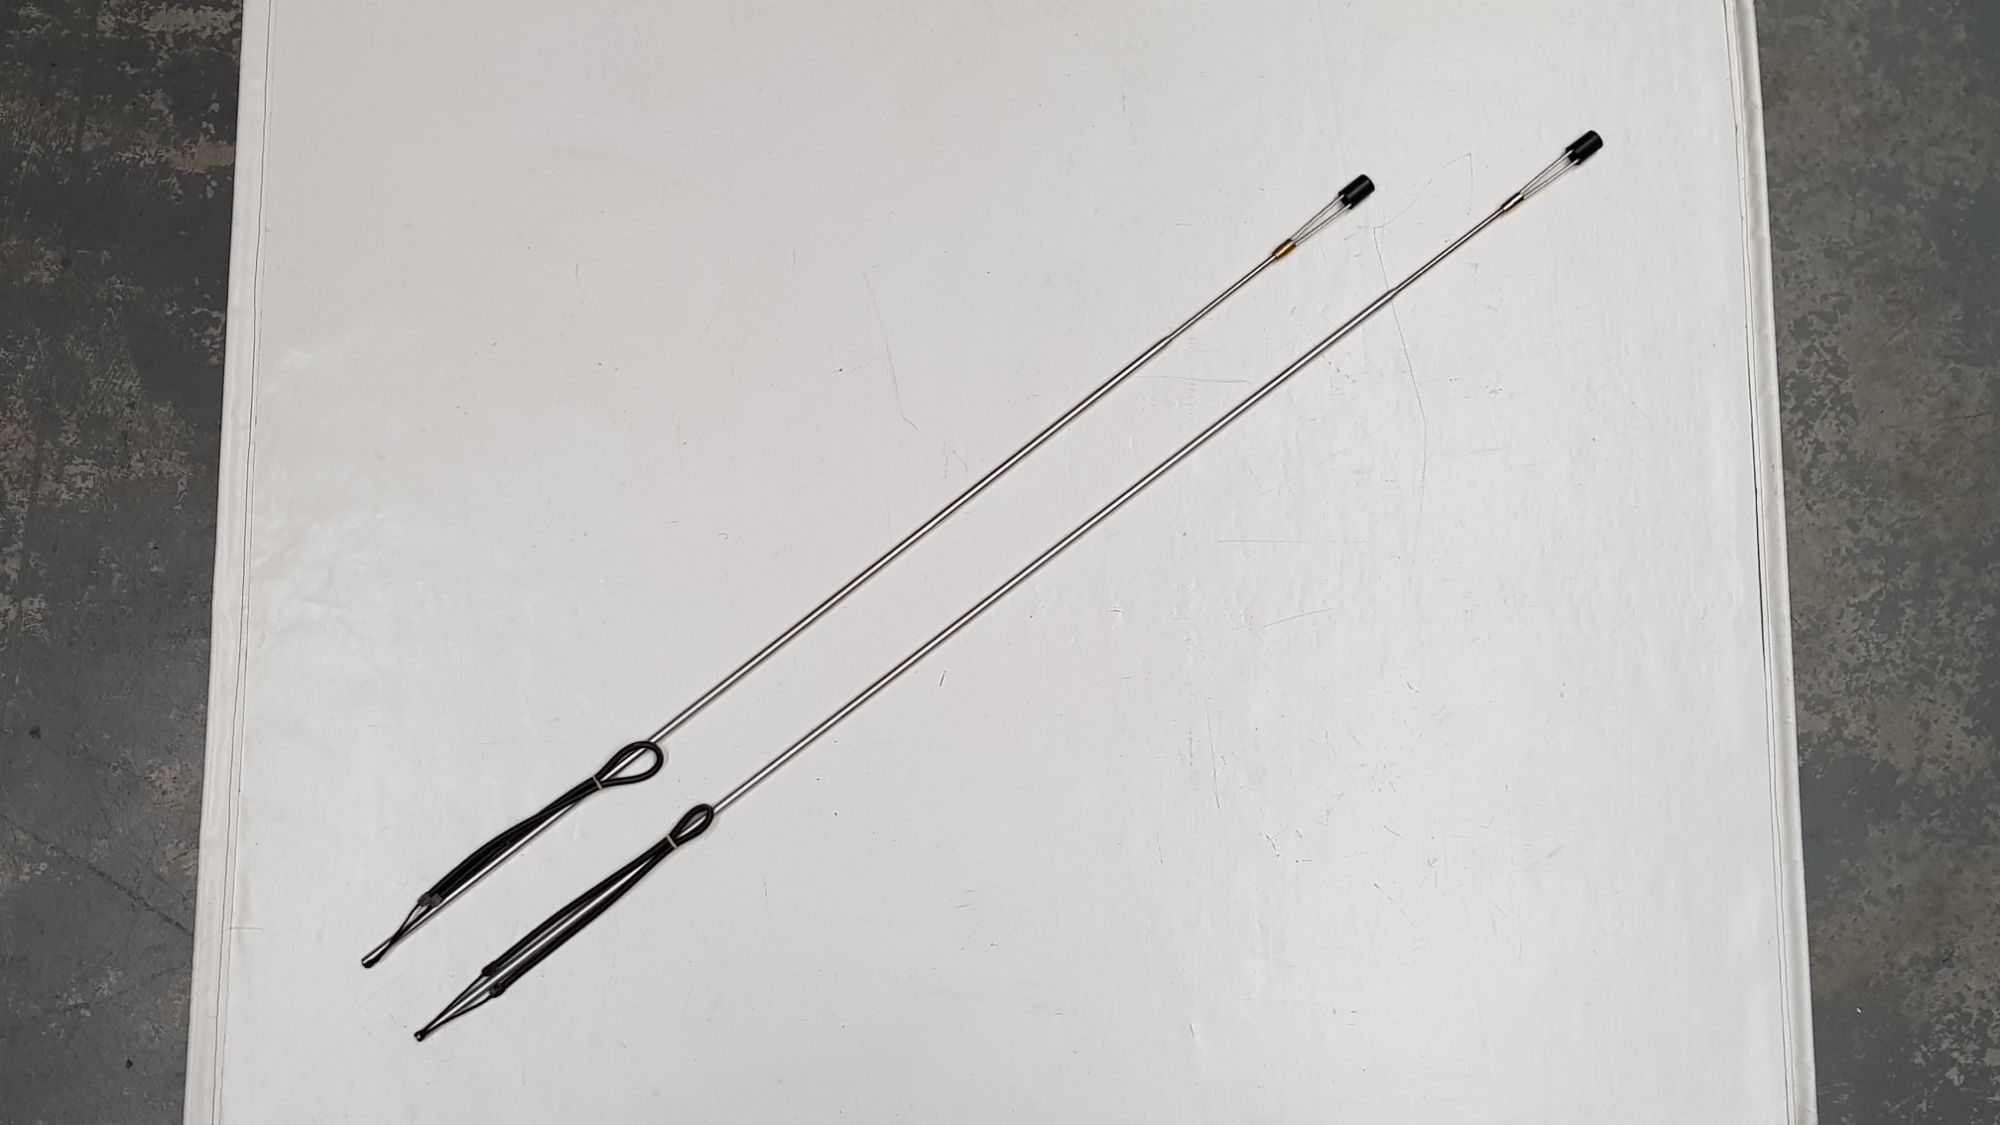 Fishing Gidgees For Sale in Perth, Western Australia